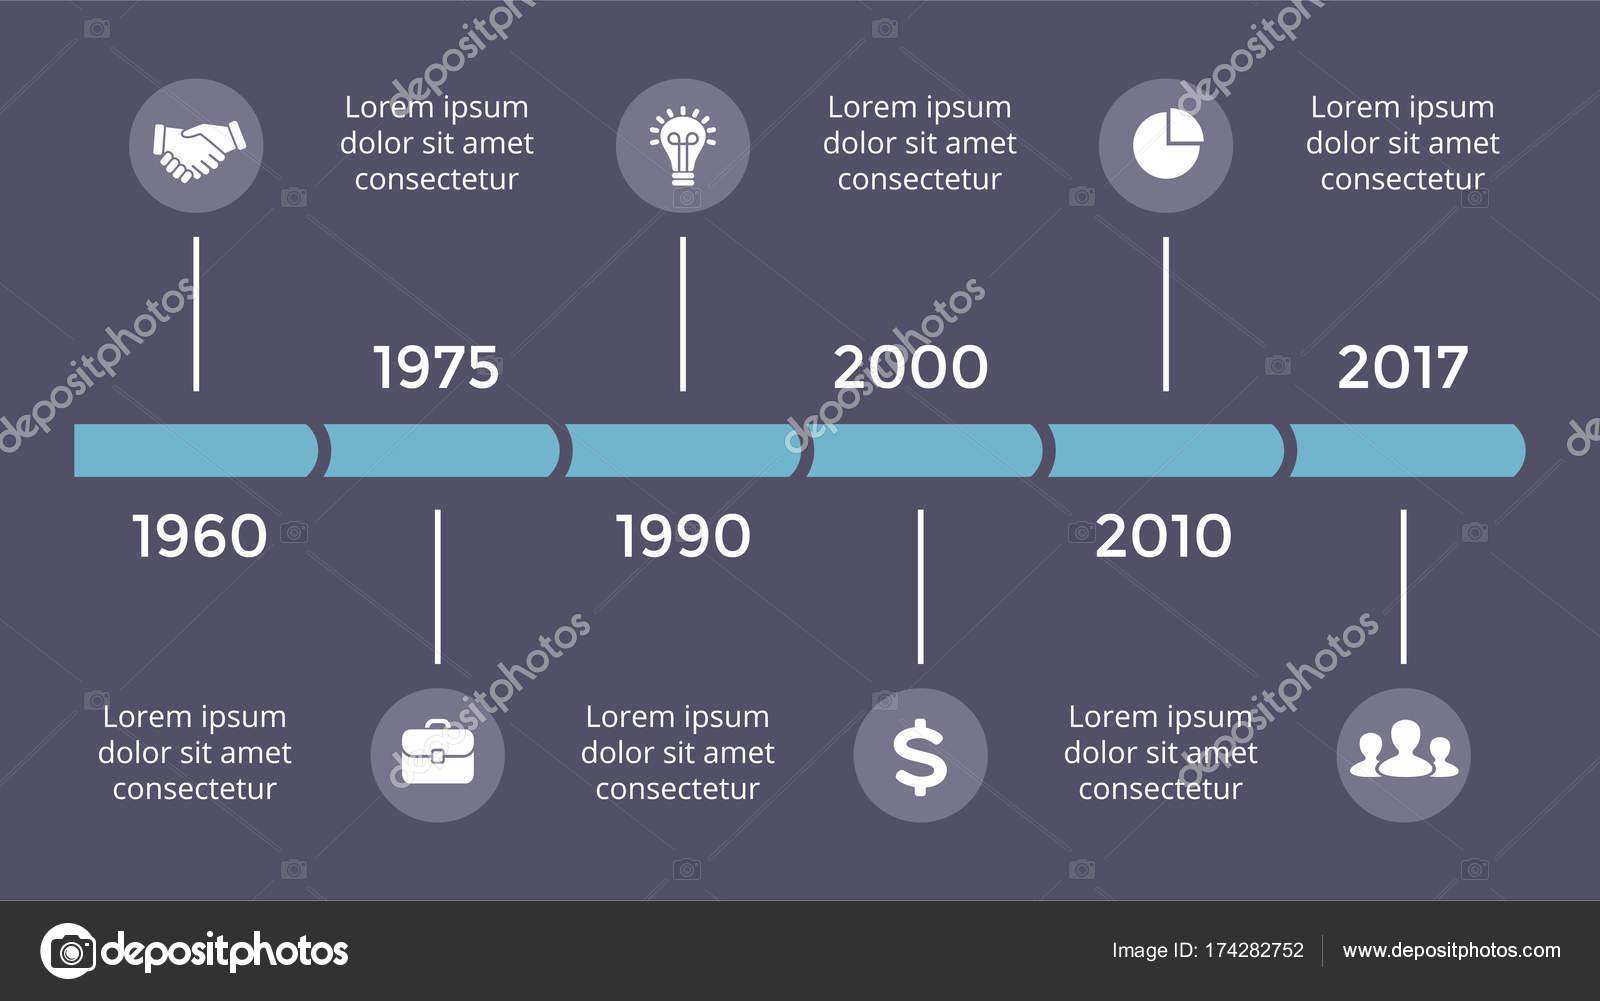 Vektor Metaball Dreiecke Timeline Infografik, Diagramm-Diagramm ...